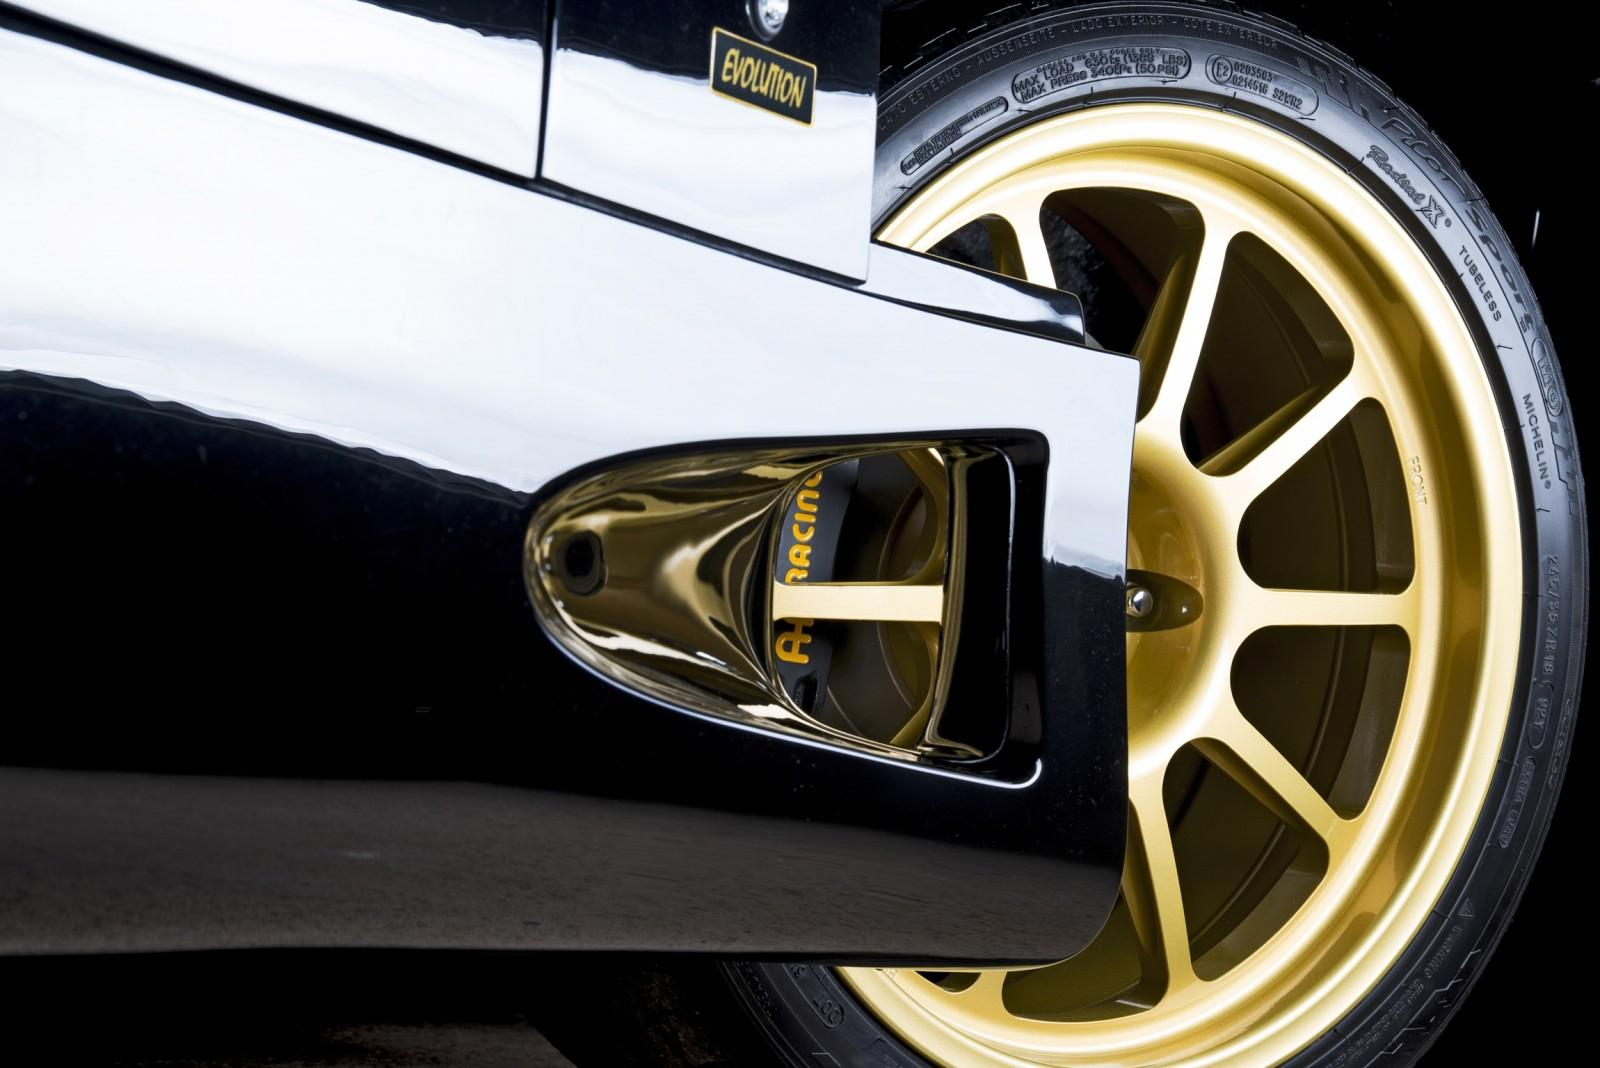 2015 ULTIMA Evolution Coupe 33